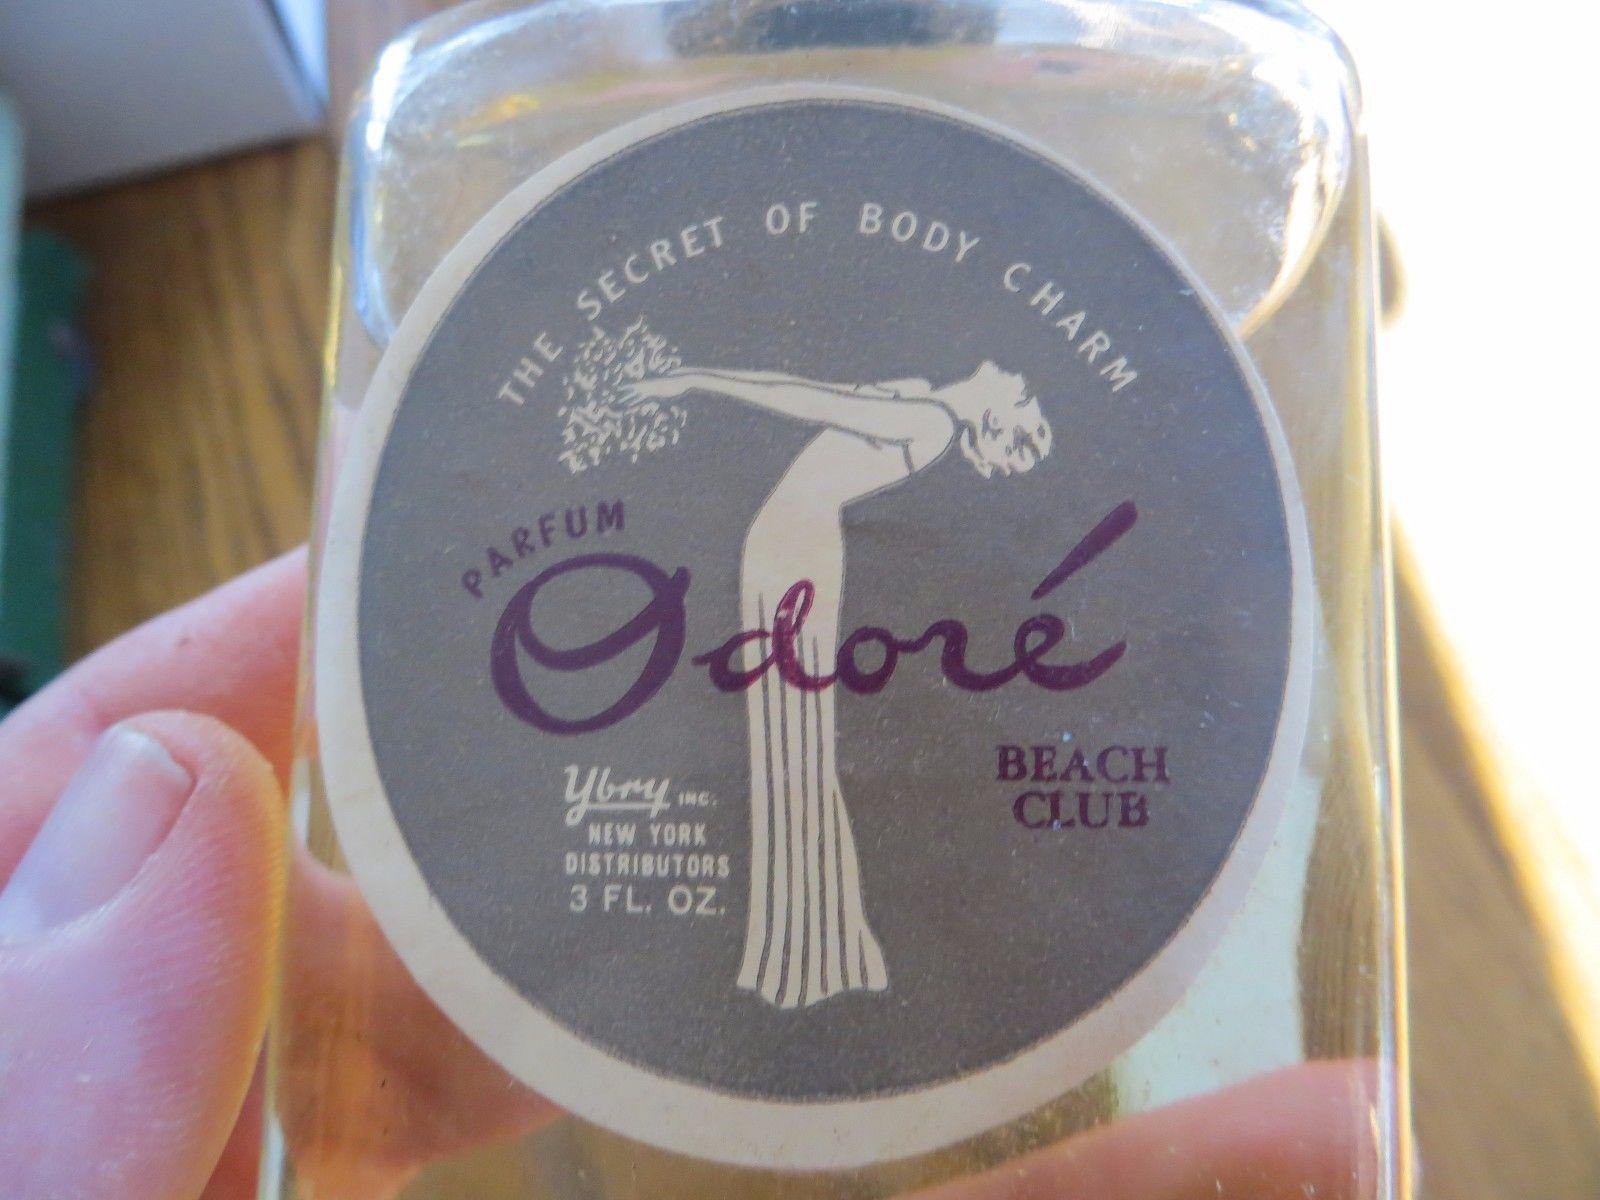 parfum Odorade Beach Club vintage collectible bottle in box, original perfume